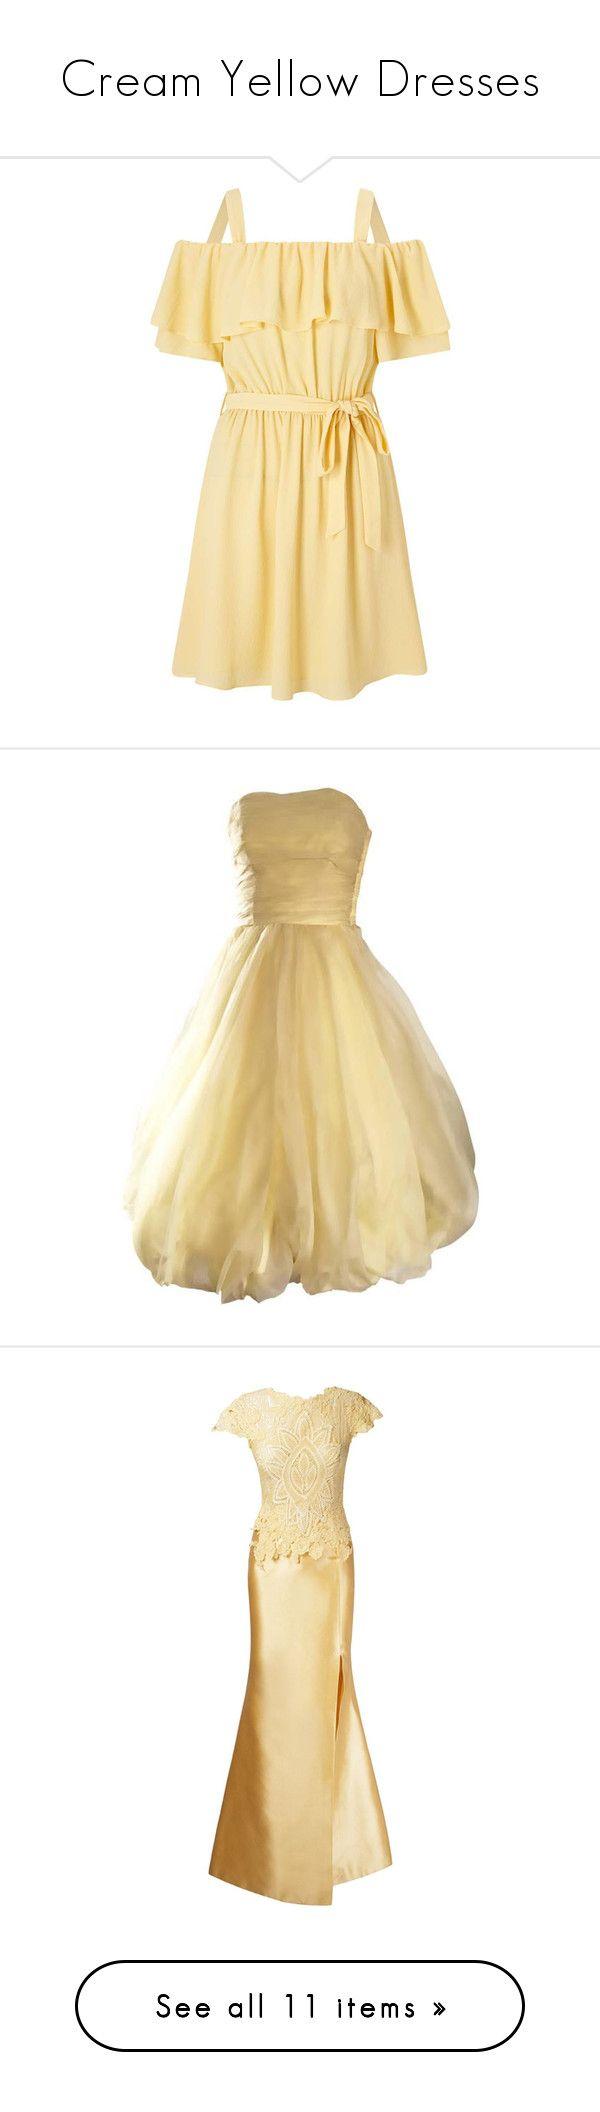 """Cream Yellow Dresses"" by tegan-b-riley on Polyvore featuring dresses, yellow, day to night dresses, short yellow dress, beige short dress, short ruffle dress, flutter-sleeve dress, vintage dresses, formal wear and evening cocktail dresses"